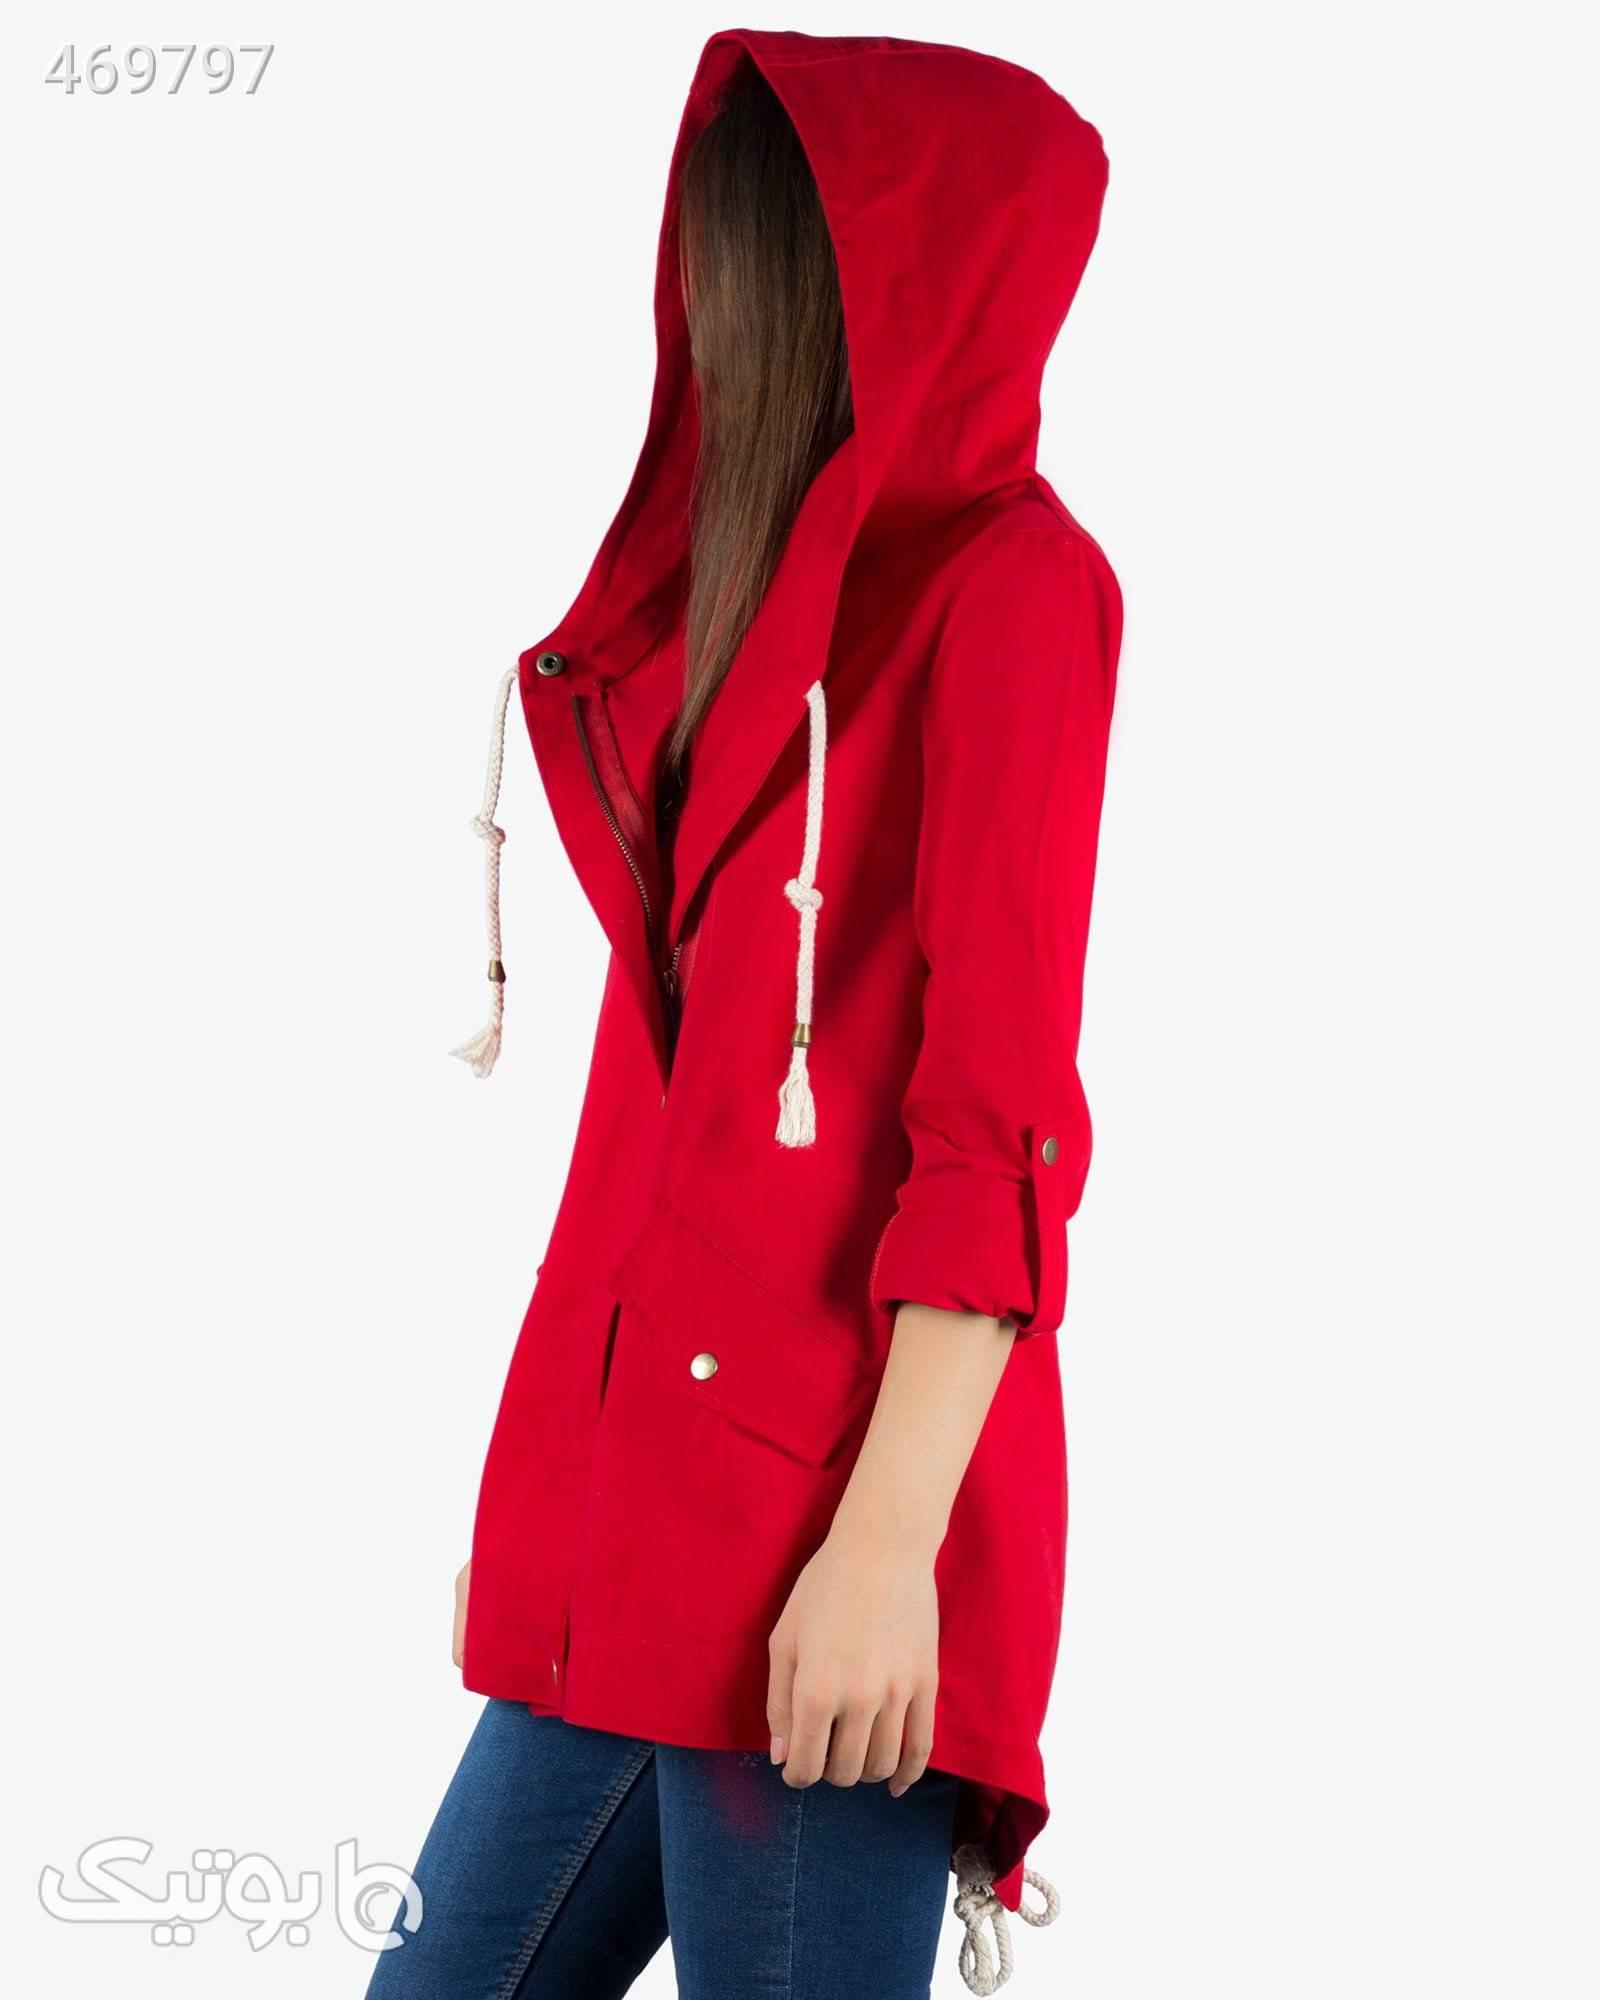 مانتو کوتاه کلاه دار پاییزه - قرمز قرمز مانتو